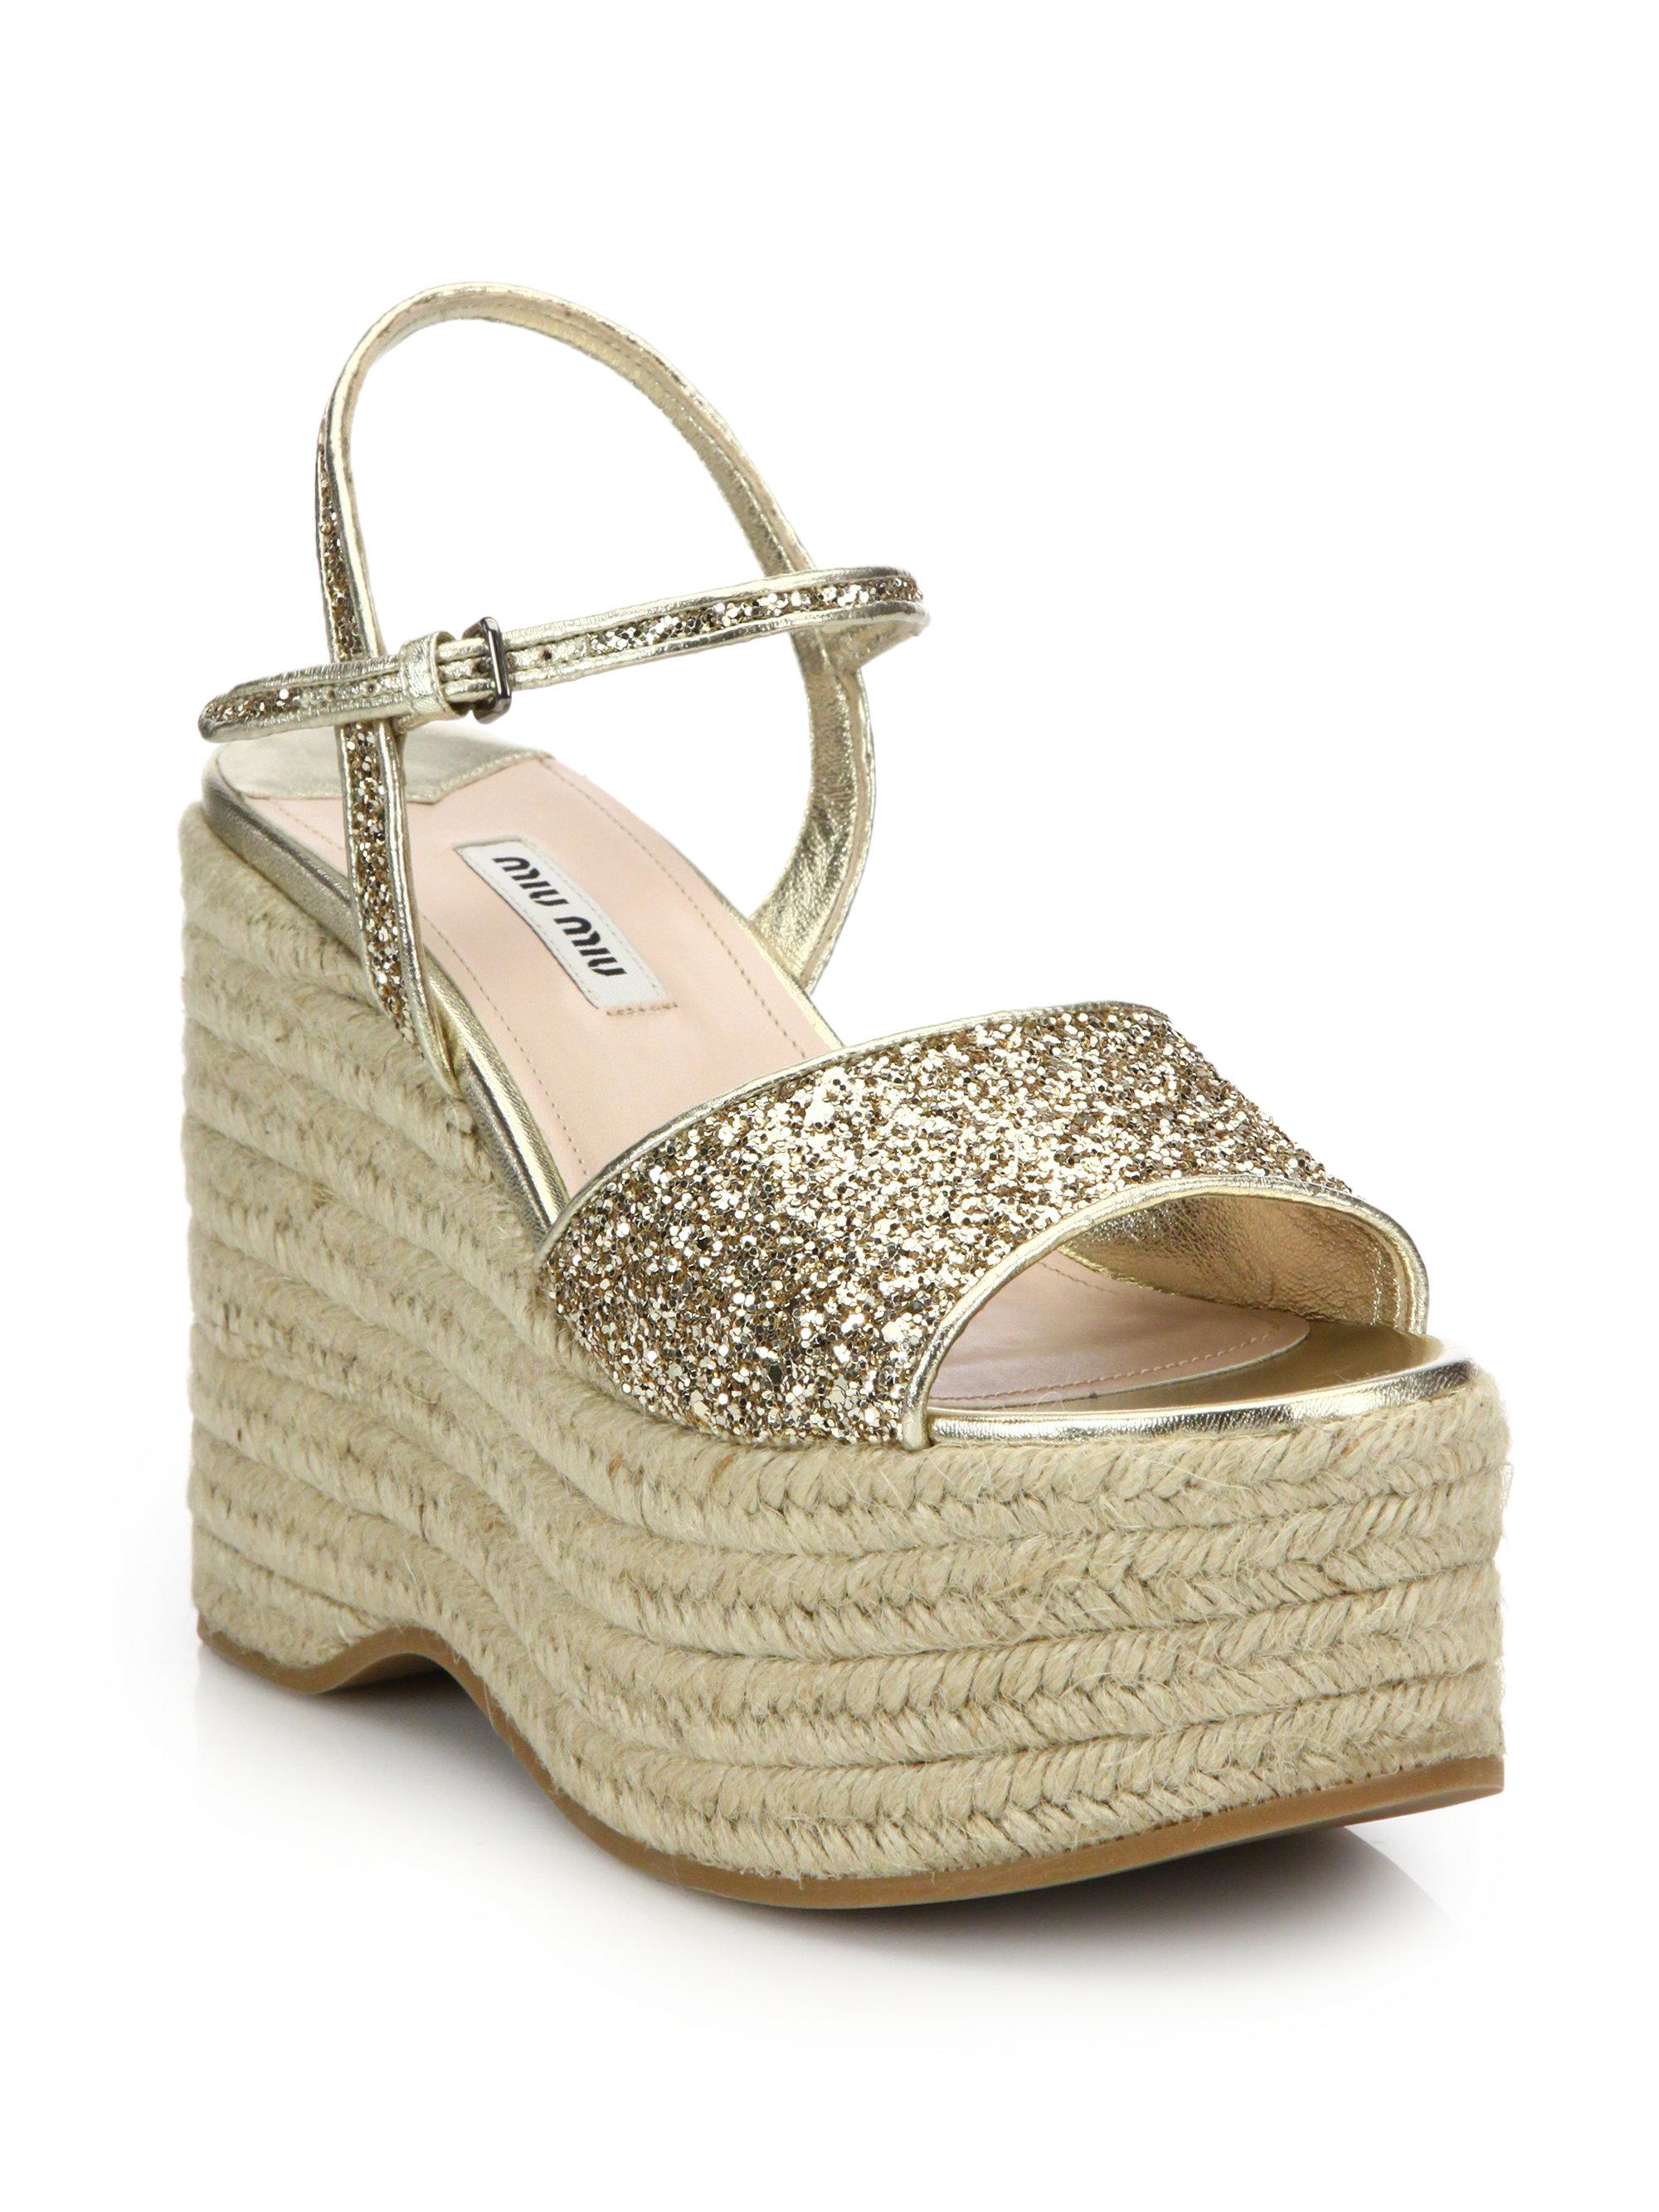 Miu Miu Leather Espadrille Sandals visit new cheap online discount 2014 unisex EmmLKn6caq